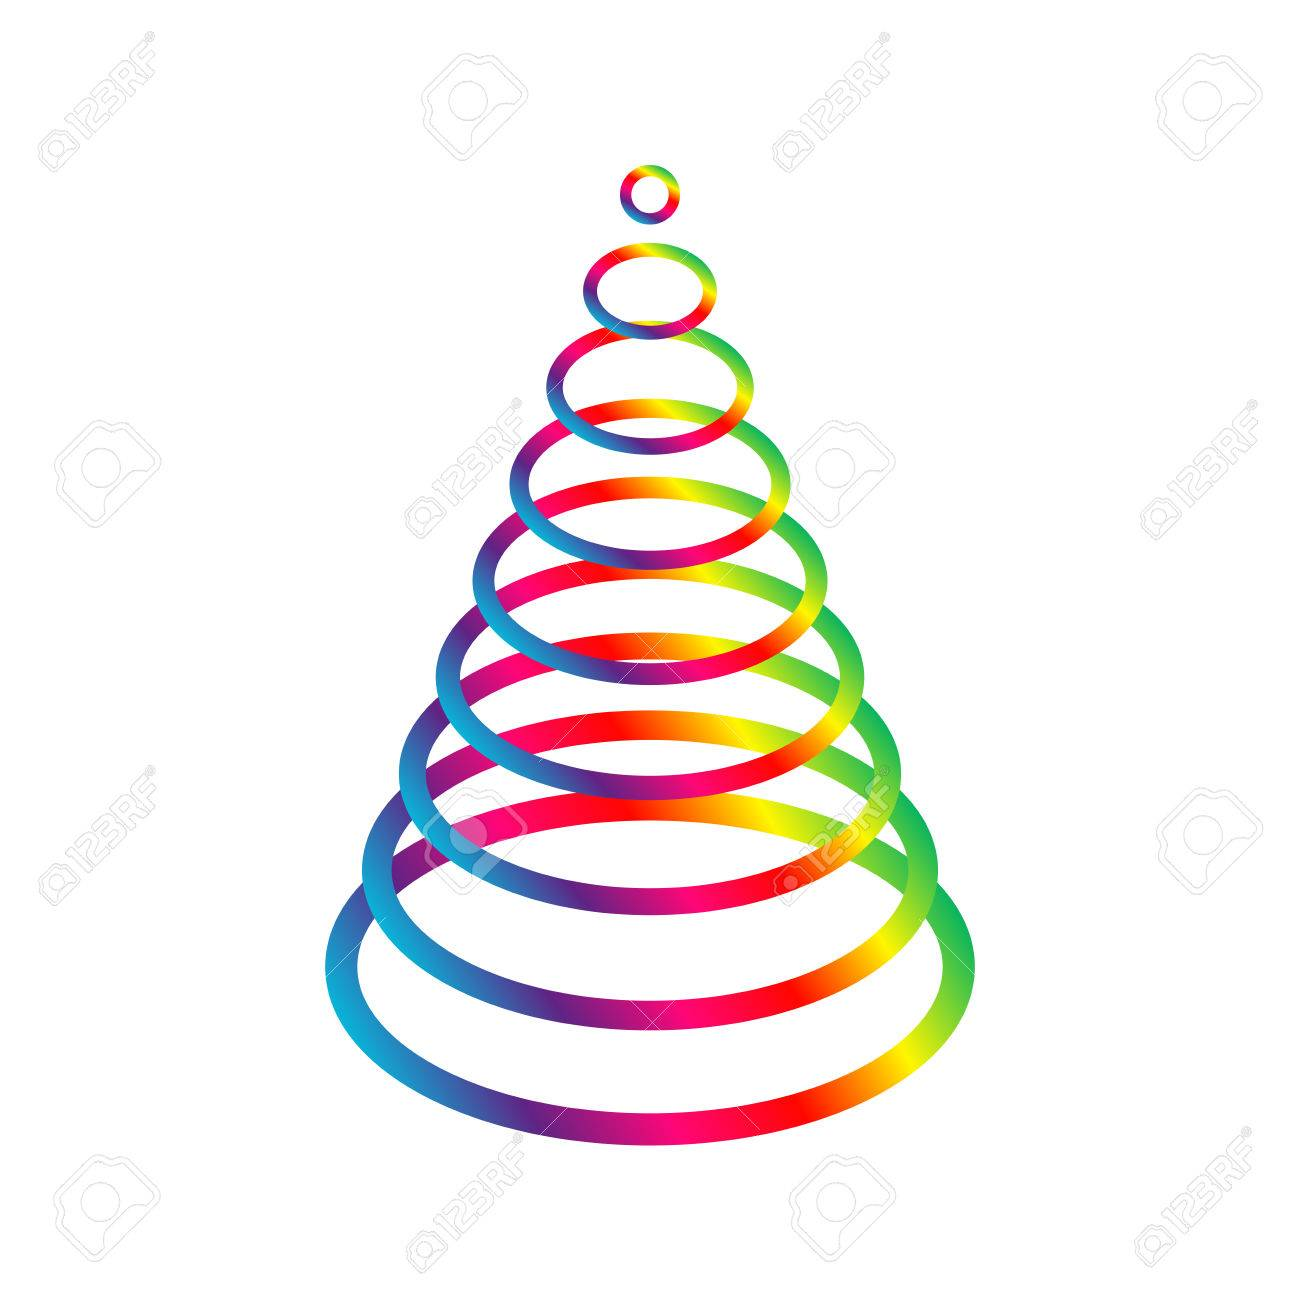 Simple Oval Rainbow Christmas Tree Elegant Spectrum Xmas Made From Rigs On White